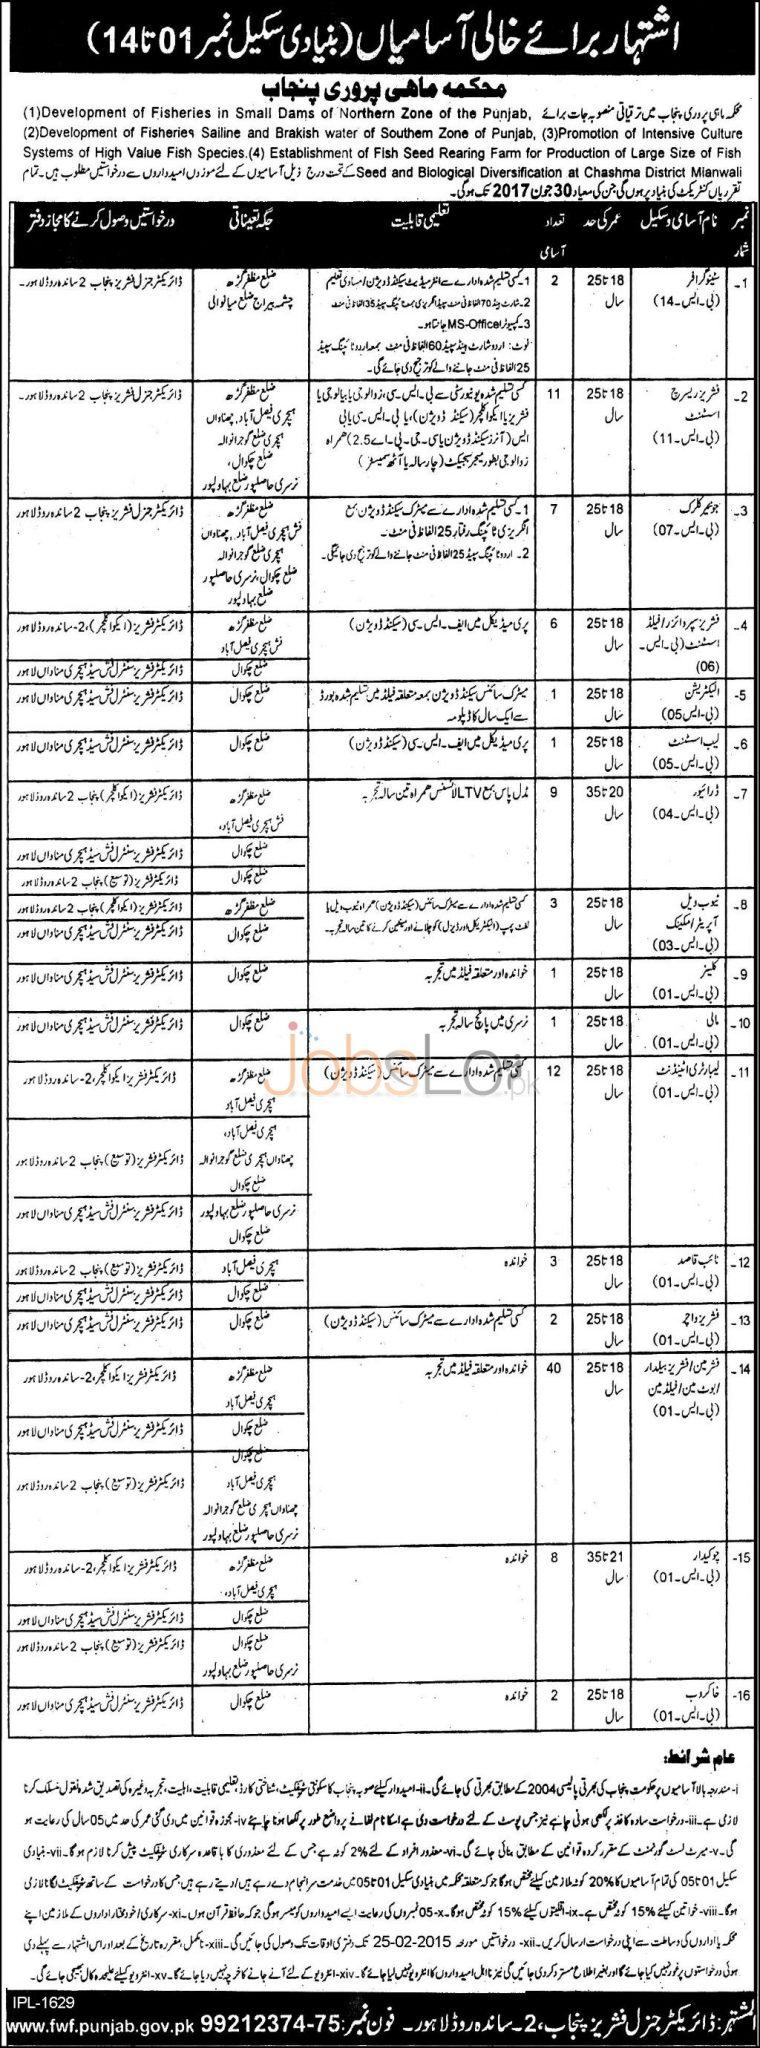 Fisheries Department Punjab Jobs 2015 Stenographer, Junior Clerk, Assistant